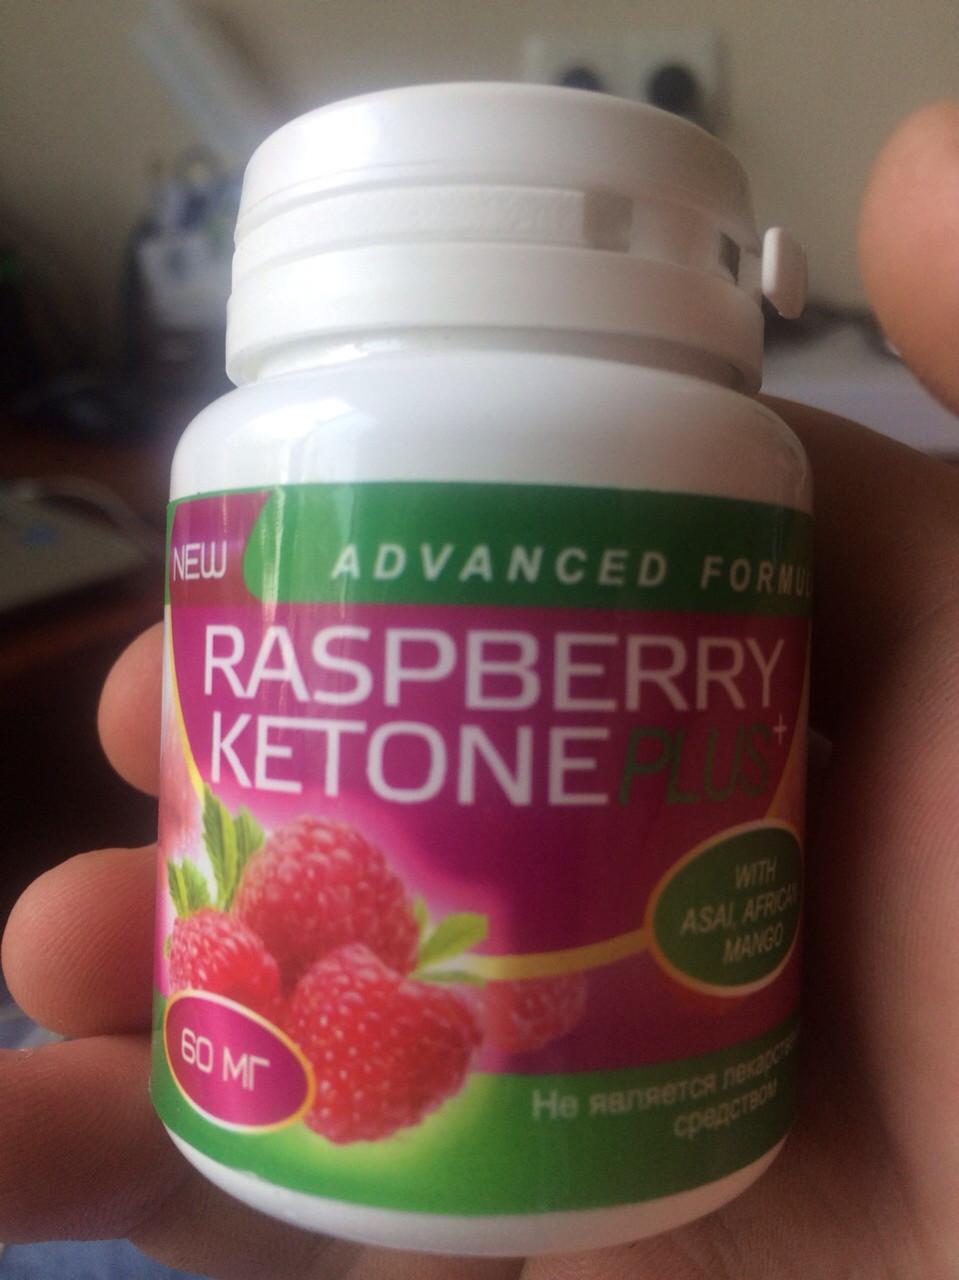 Raspberry Ketoneмалиновый ViPpils